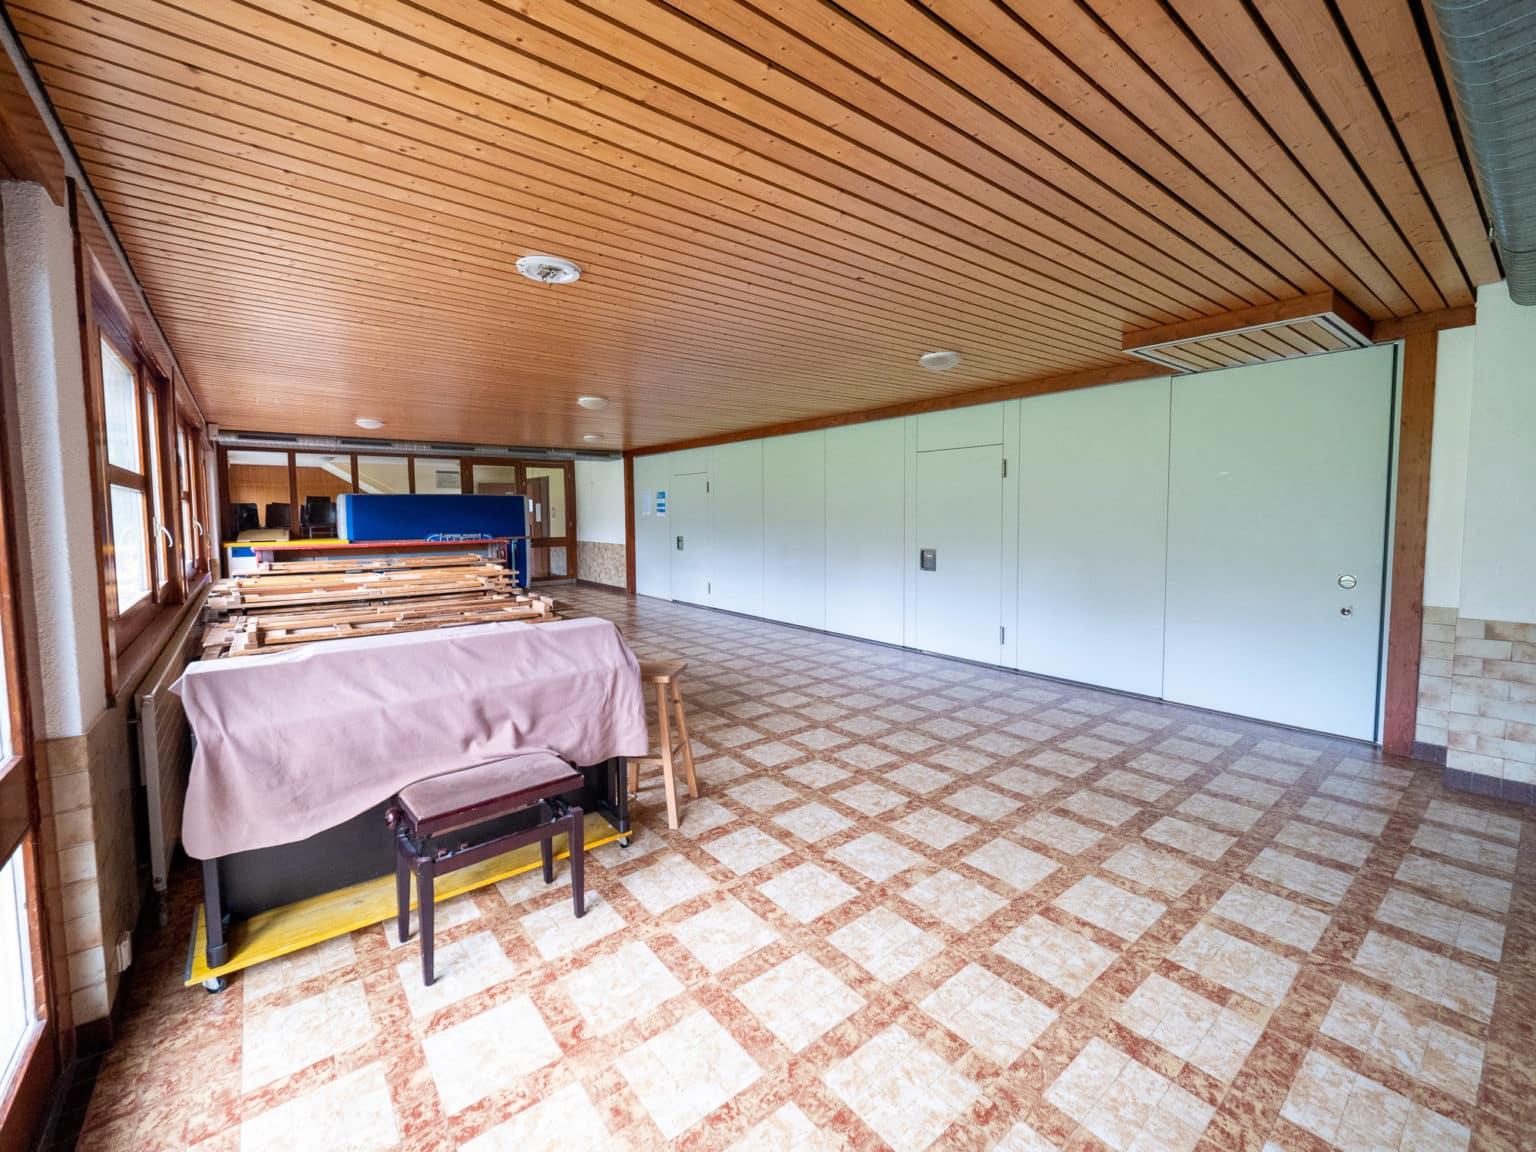 Refuges-salles-Montanaire©V-Dubach-52742